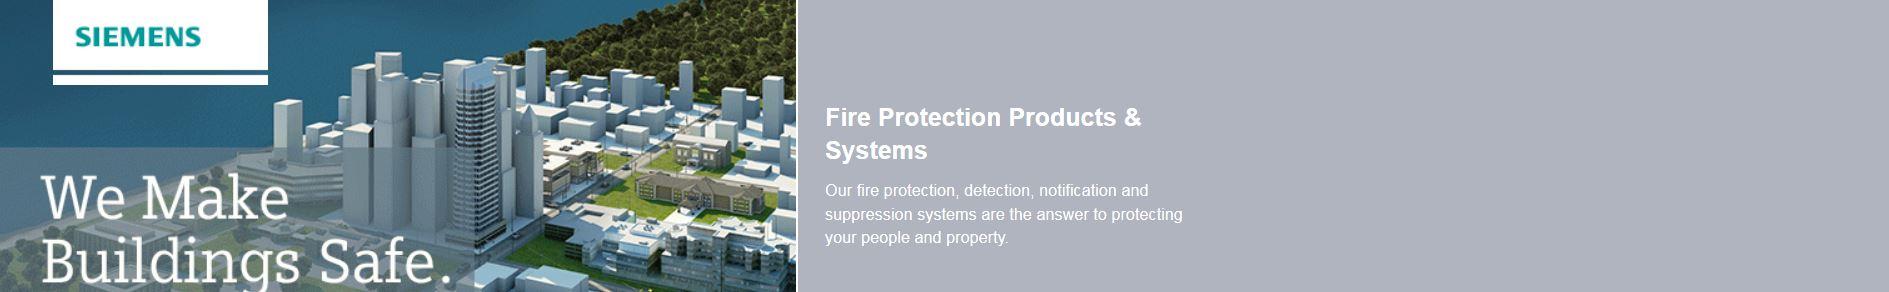 Siemens Fire Alarm